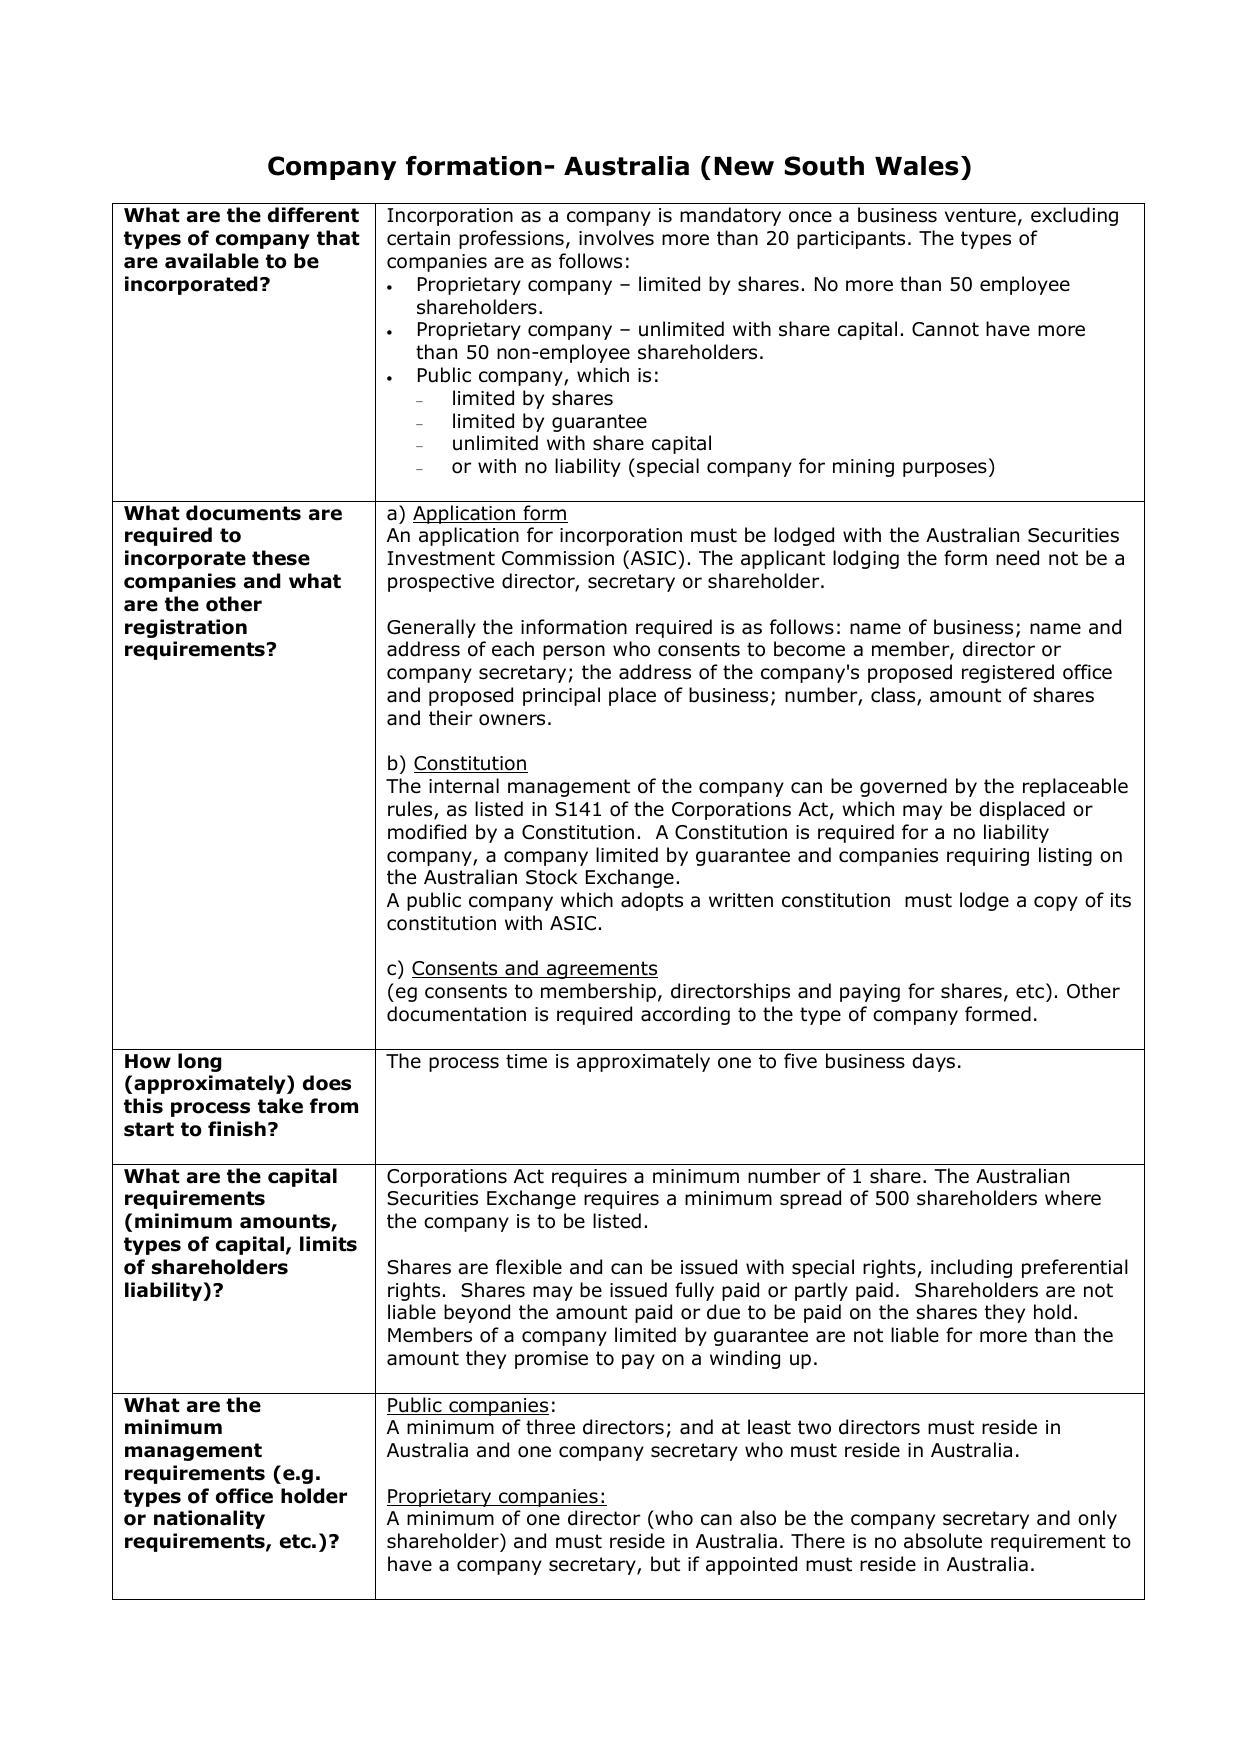 Company formation- Australia (New South Wales)